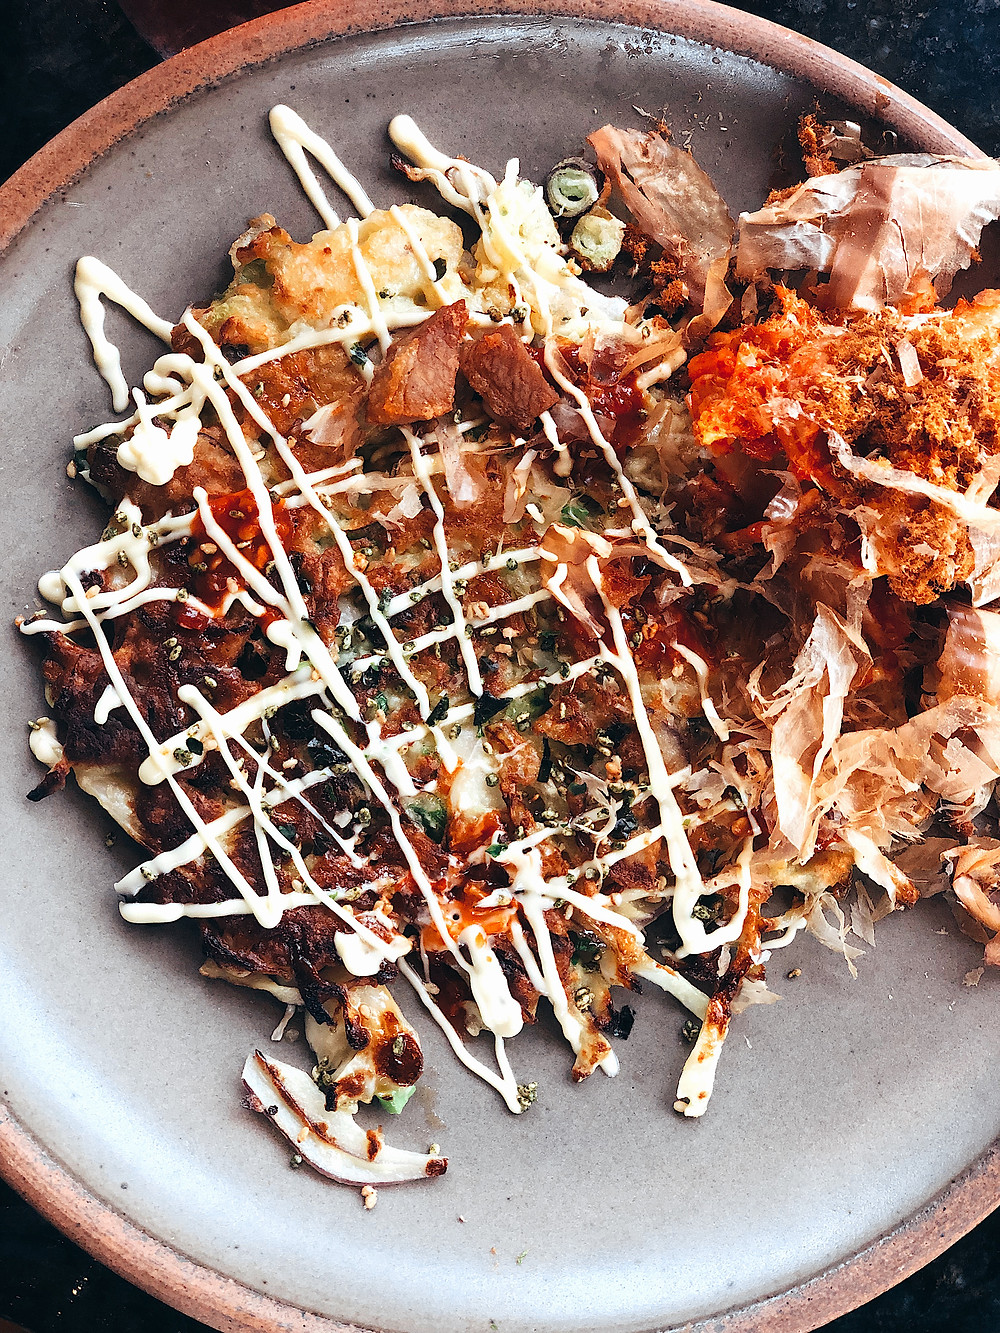 Gan Shan Station, Asheville restaurant, Okonomiyaki Japanese cabbage pancake, Asian food and fare, Visit Asheville, local favorite